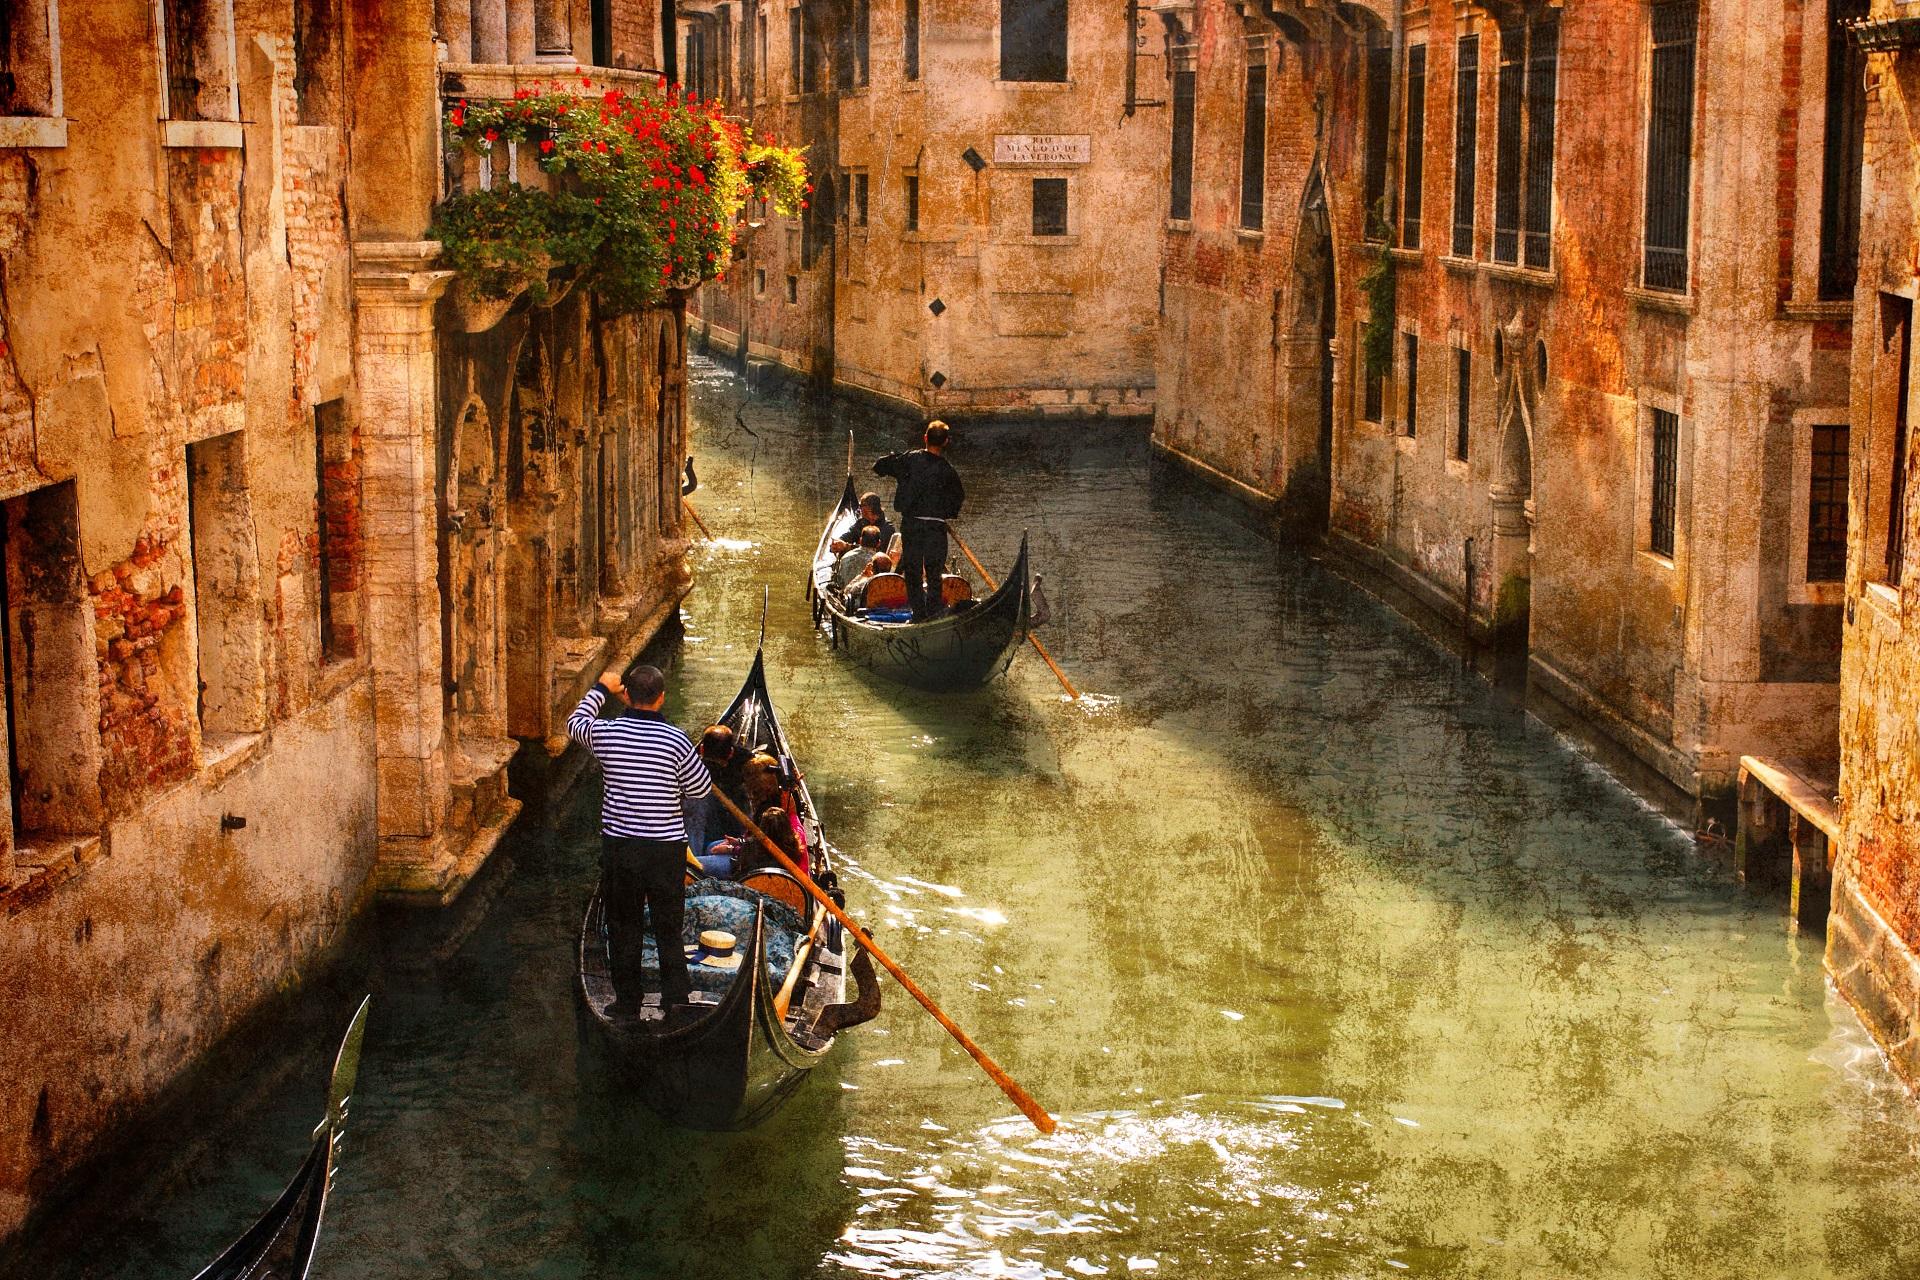 Erlebt den perfekten Romantikurlaub in Venedig!